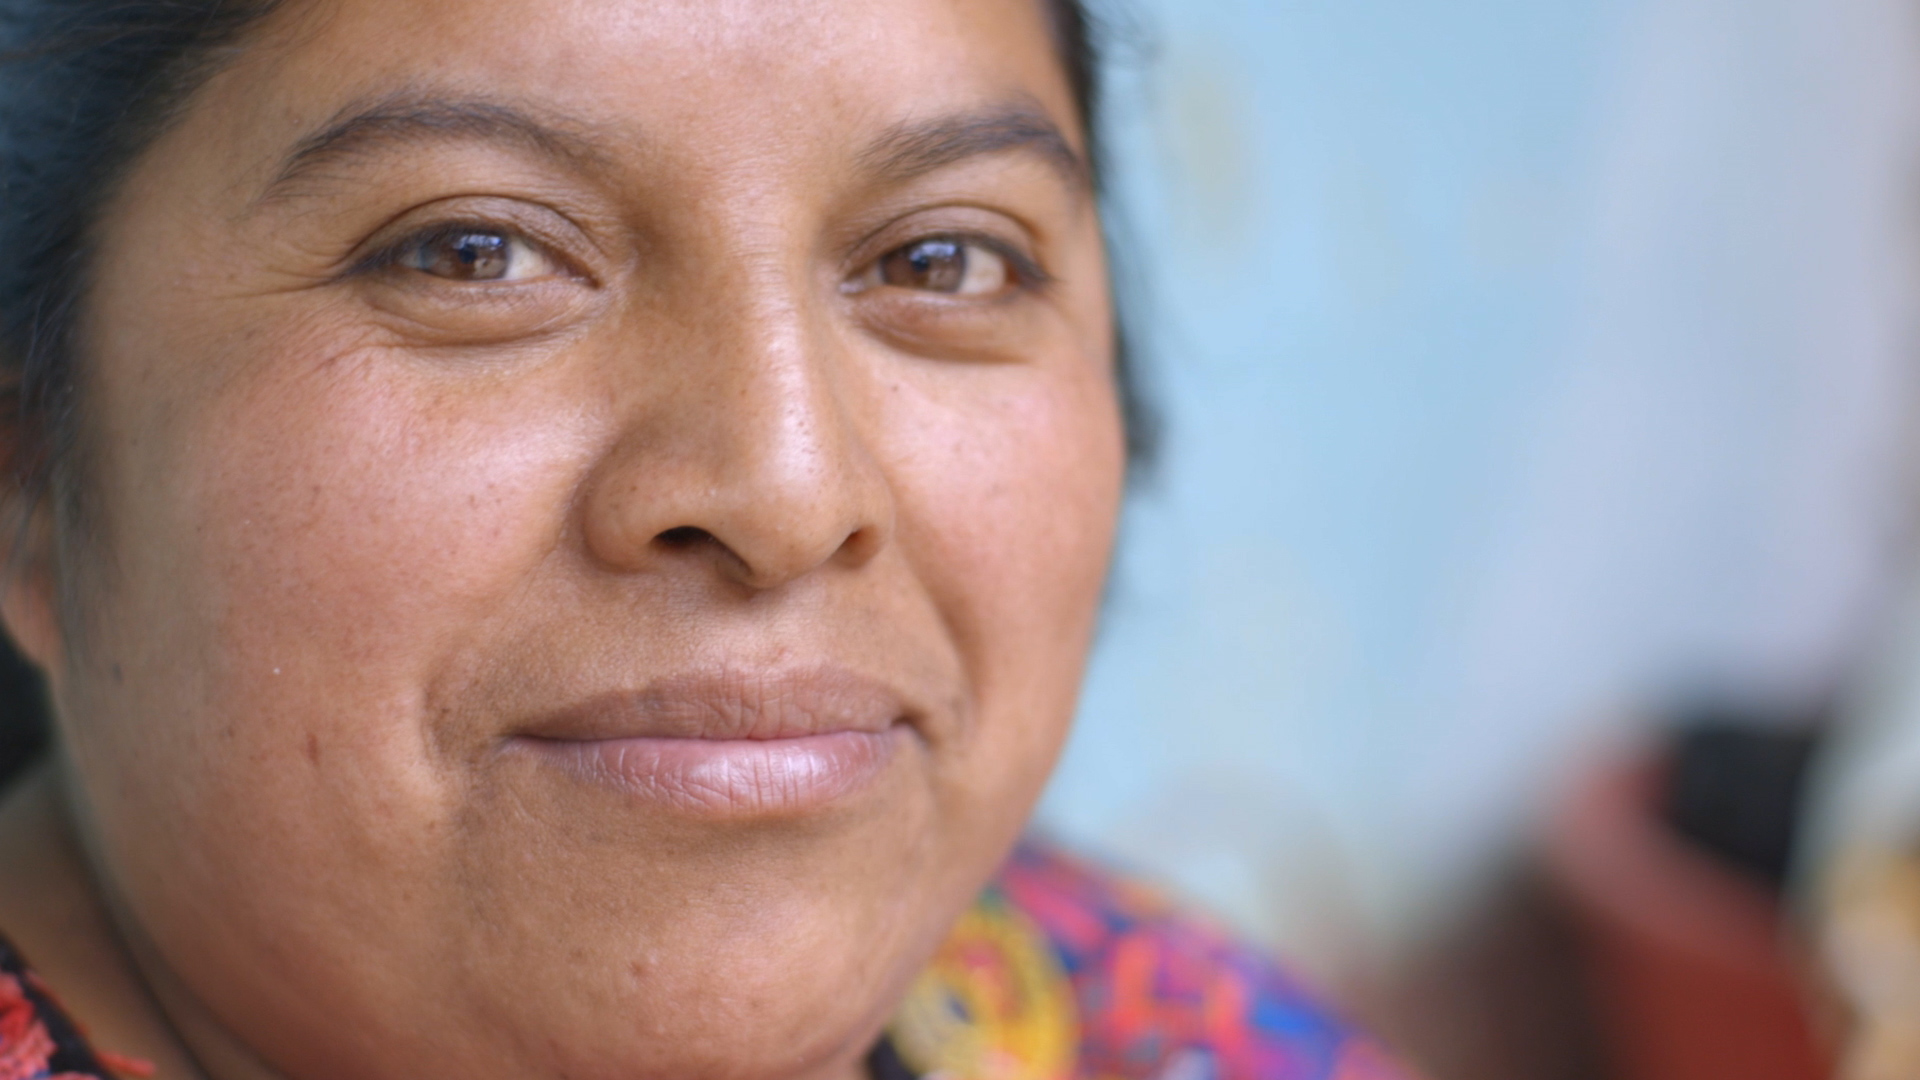 Friendship Bridge - Yolanda   The story of Yolanda and how she used a micro-finance loan to change her life and improve her community.  https://www.friendshipbridge.org/